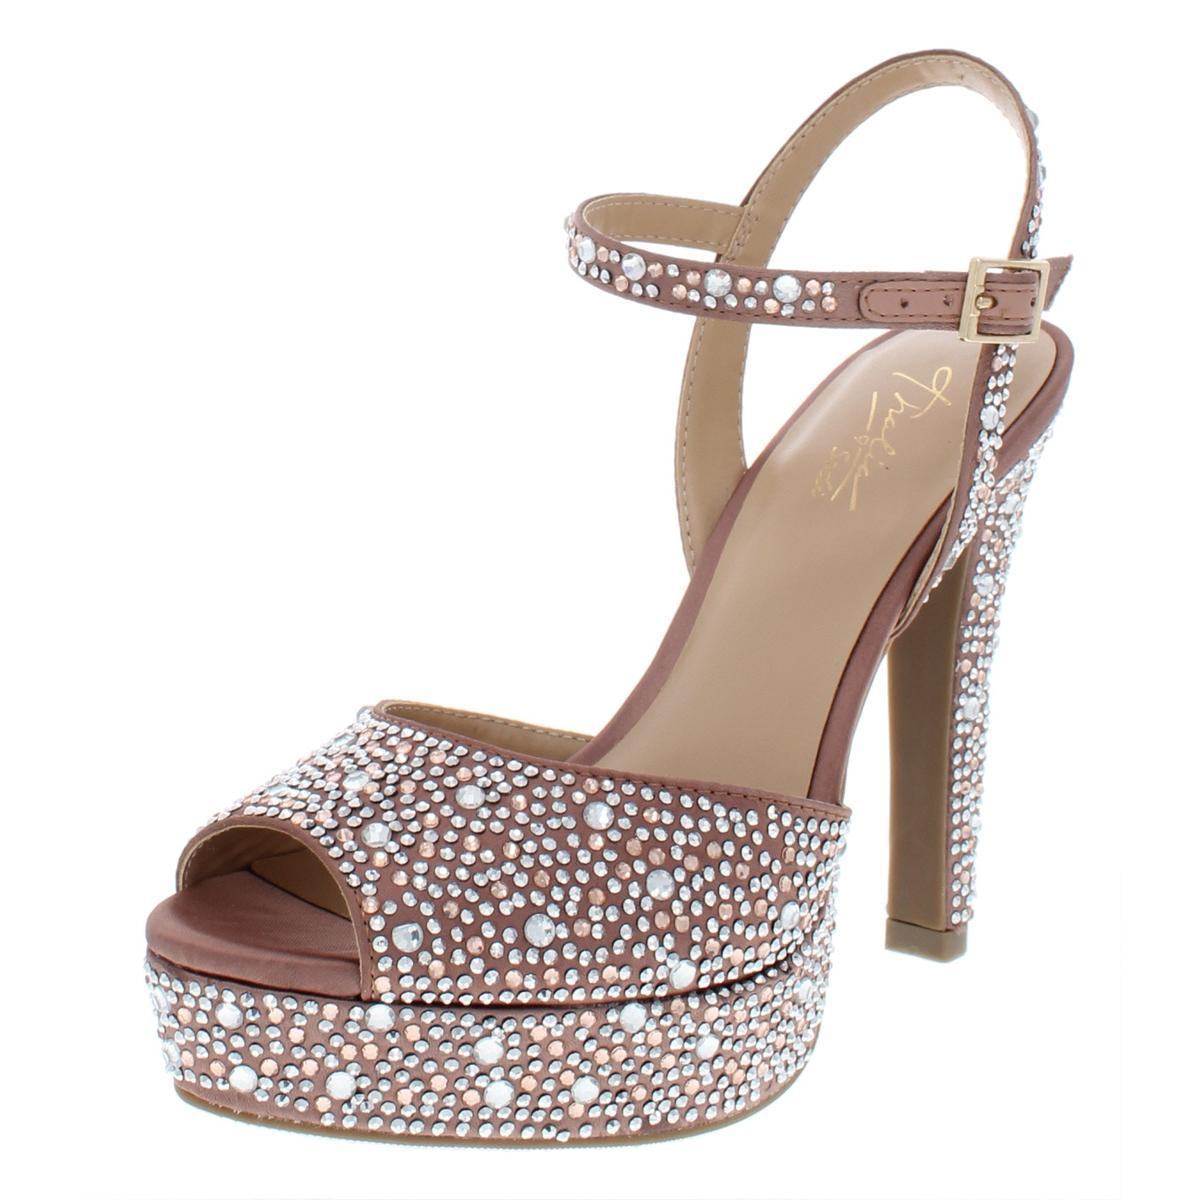 4e864e73a3d Details about Thalia Sodi Womens Bridget Satin Platform Peep Toe Dress  Sandals Heels BHFO 3219